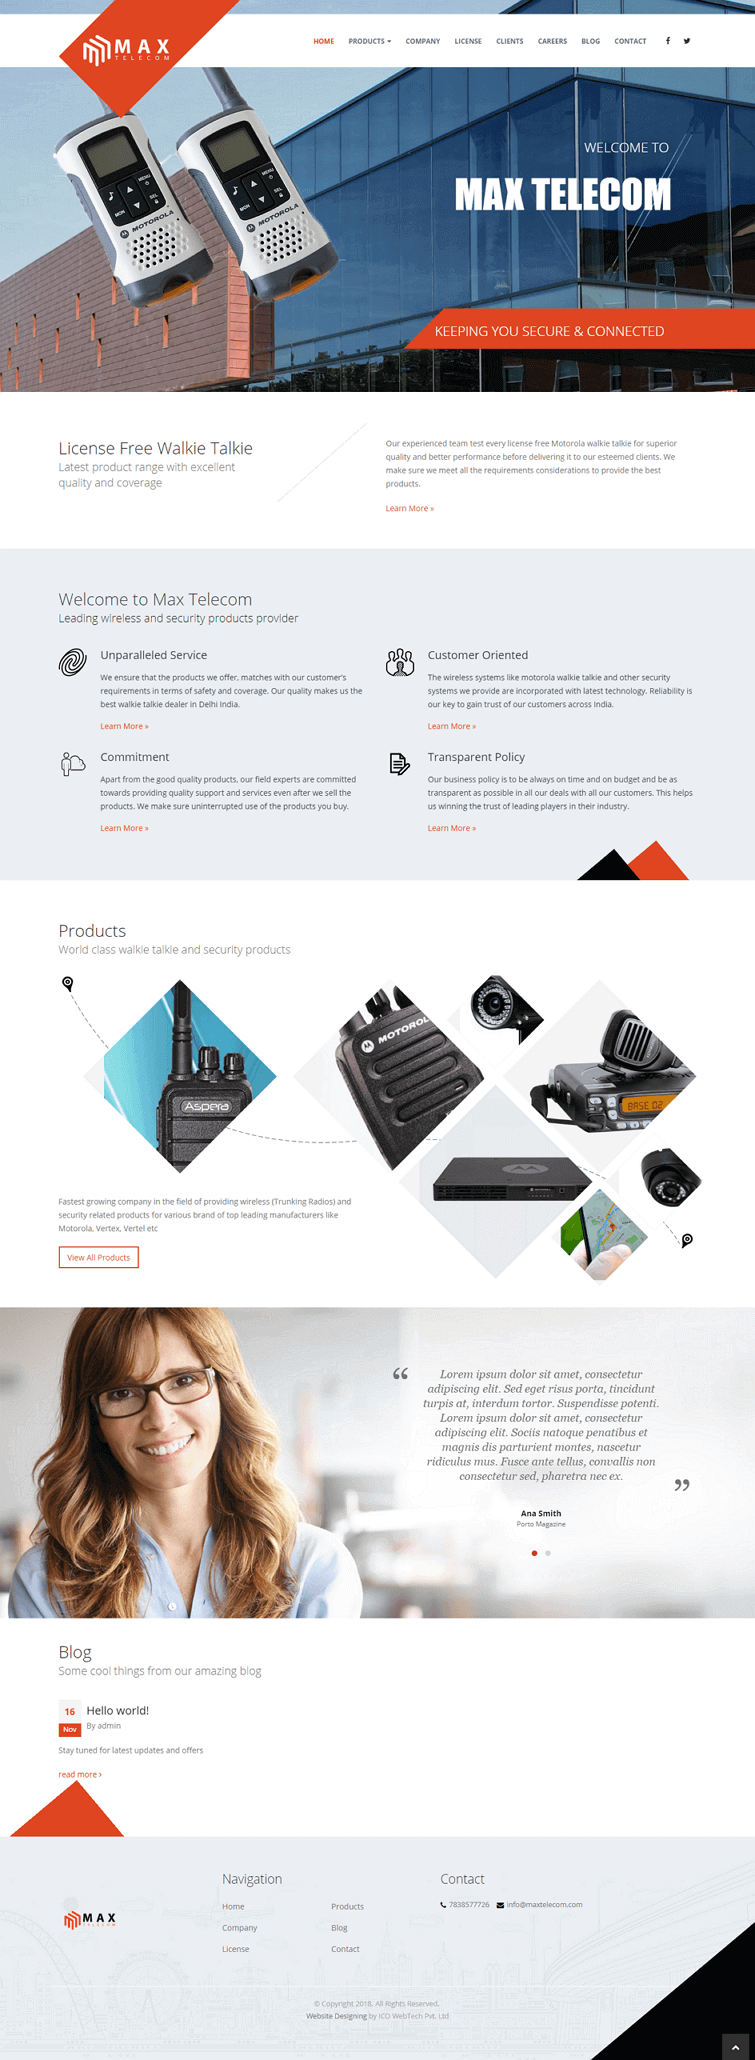 After website redesign | ICO WebTech Pvt. Ltd.